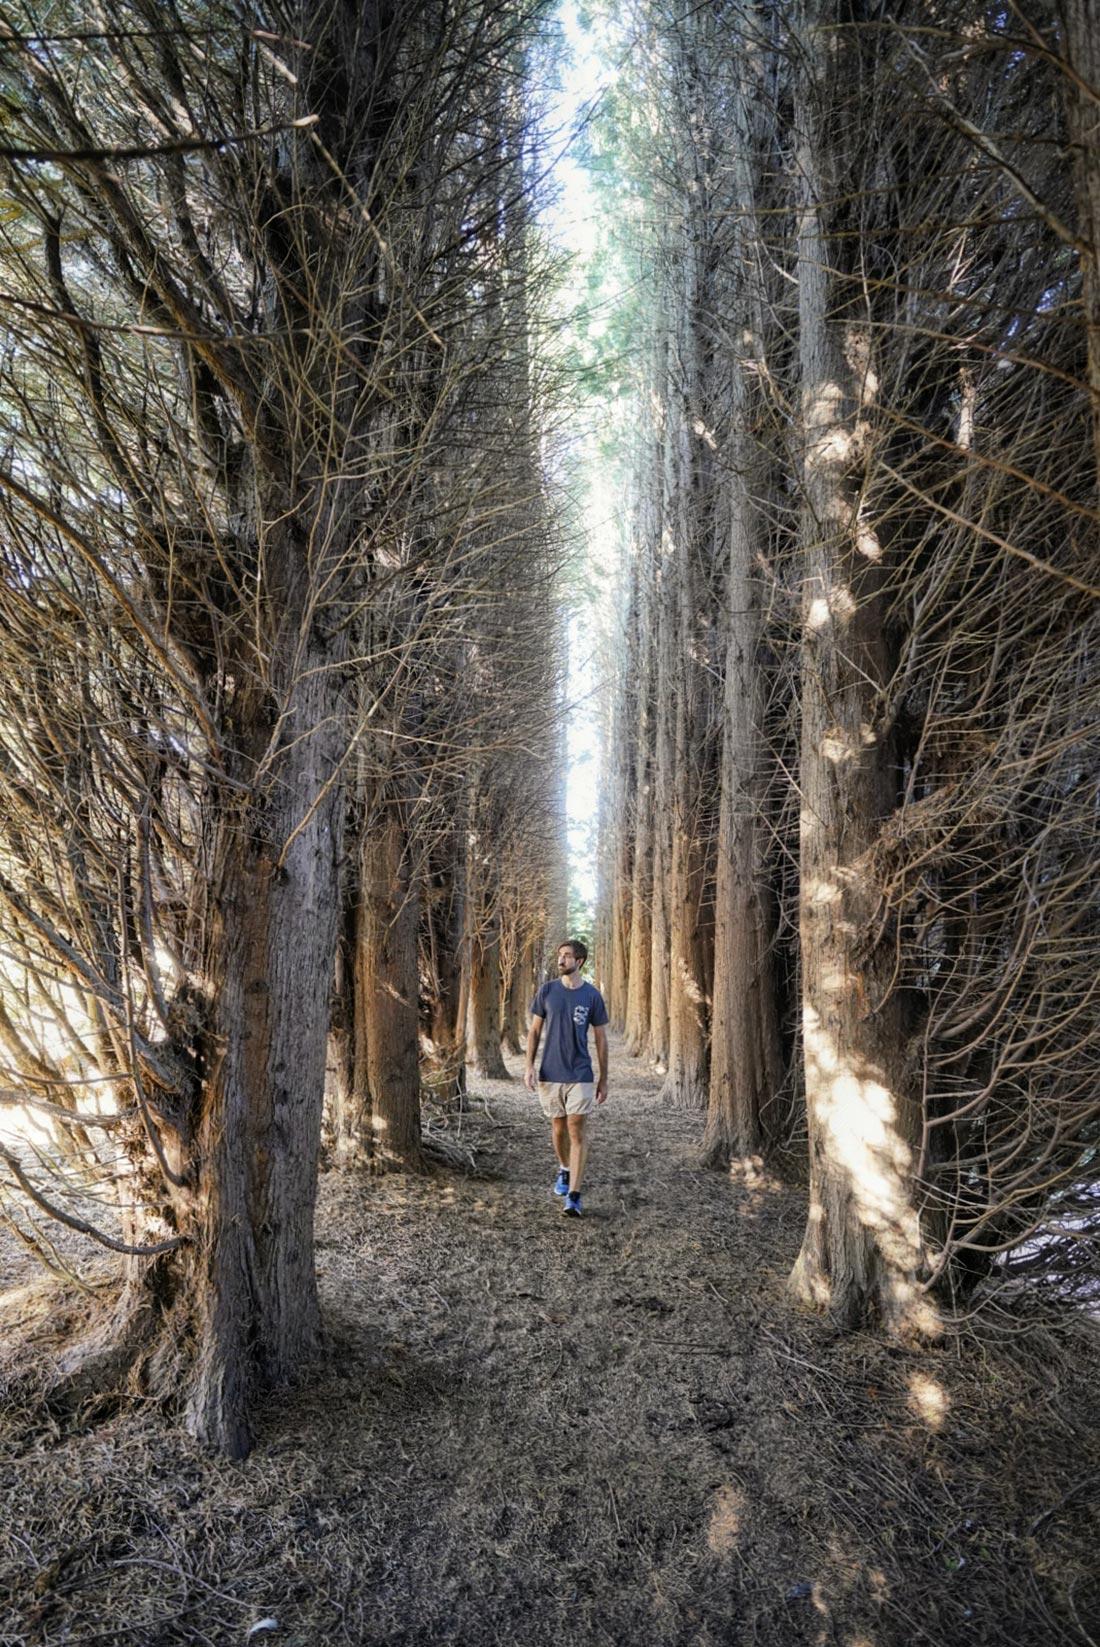 bedgebury pinetum trees